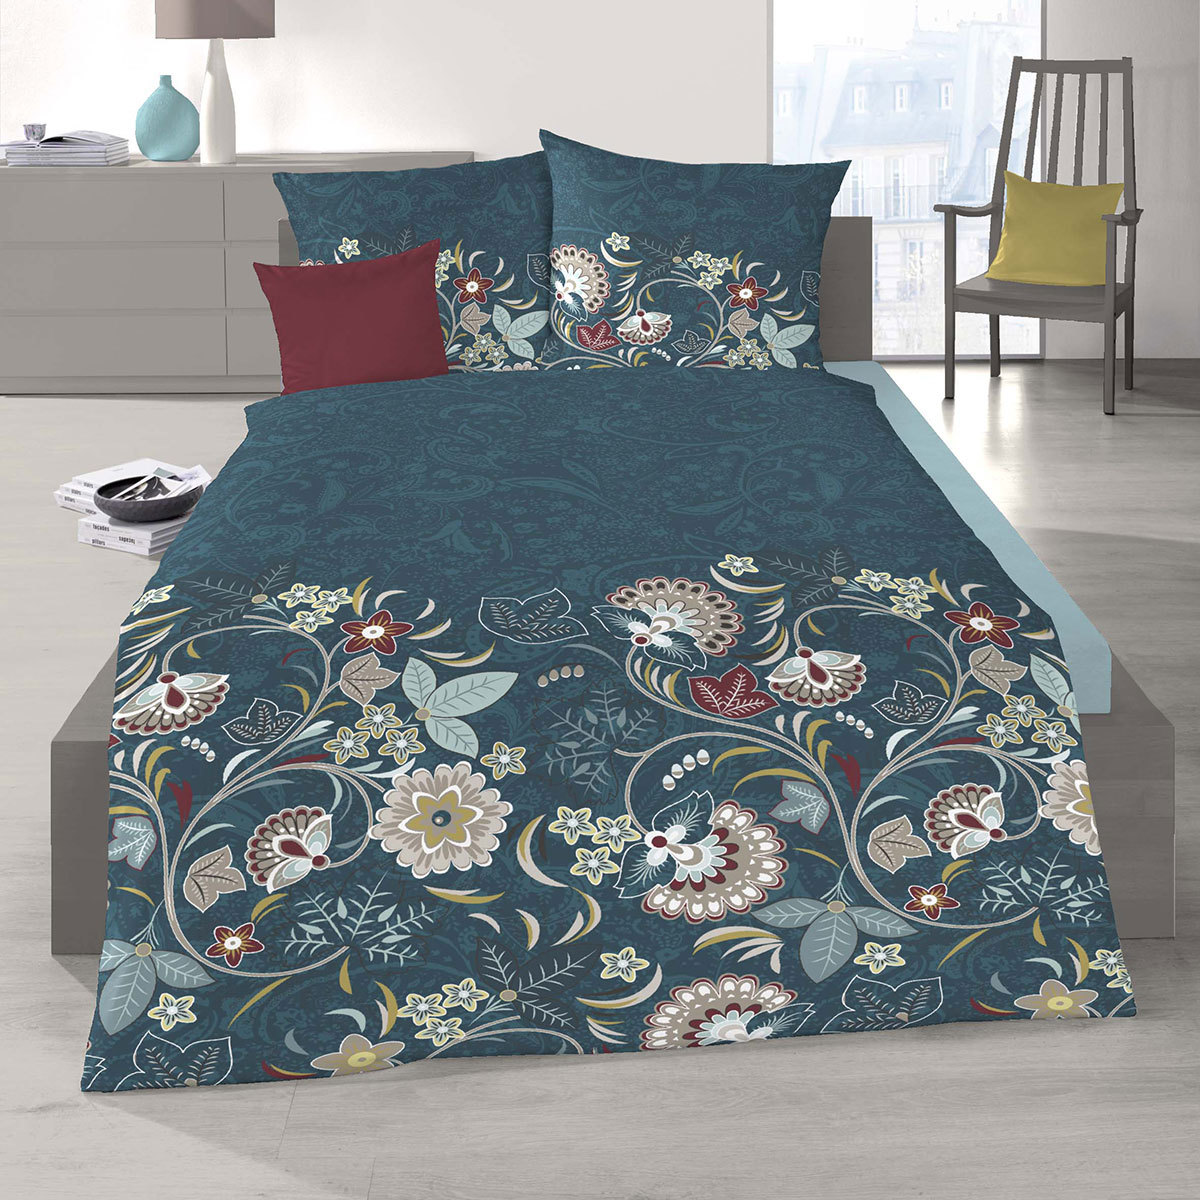 schlafgut soft touch cotton bettw sche tiara amazonas. Black Bedroom Furniture Sets. Home Design Ideas